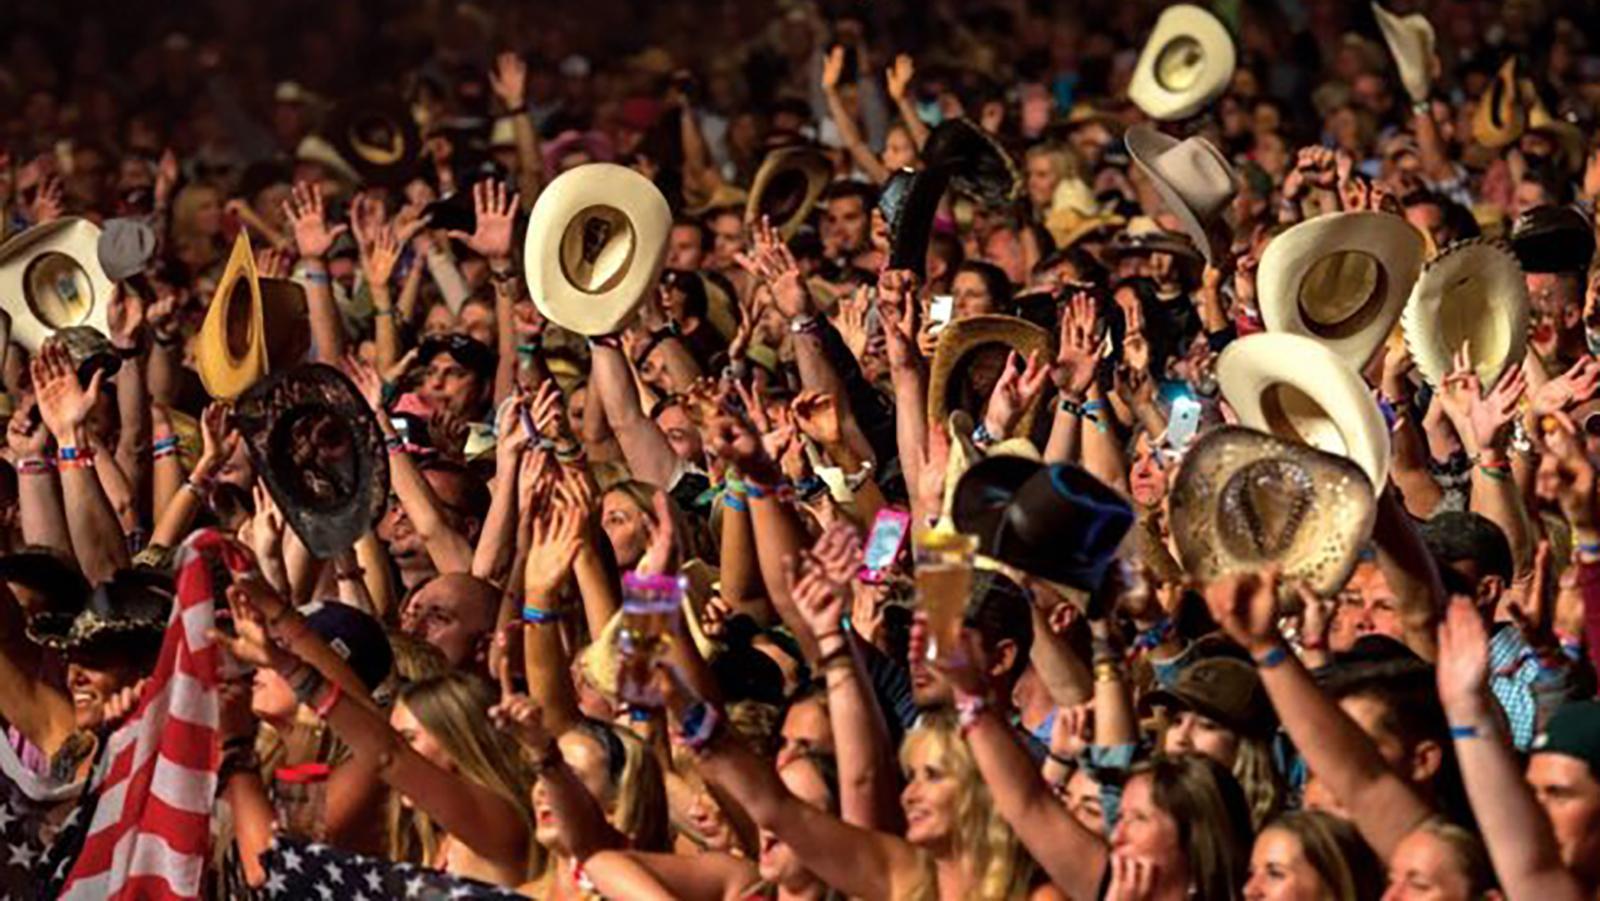 2020 Stagecoach Country Music Festival - 3 Day Pass (4/24 - 4/26) (Thomas Rhett, Carrie Underwood, Eric Church)